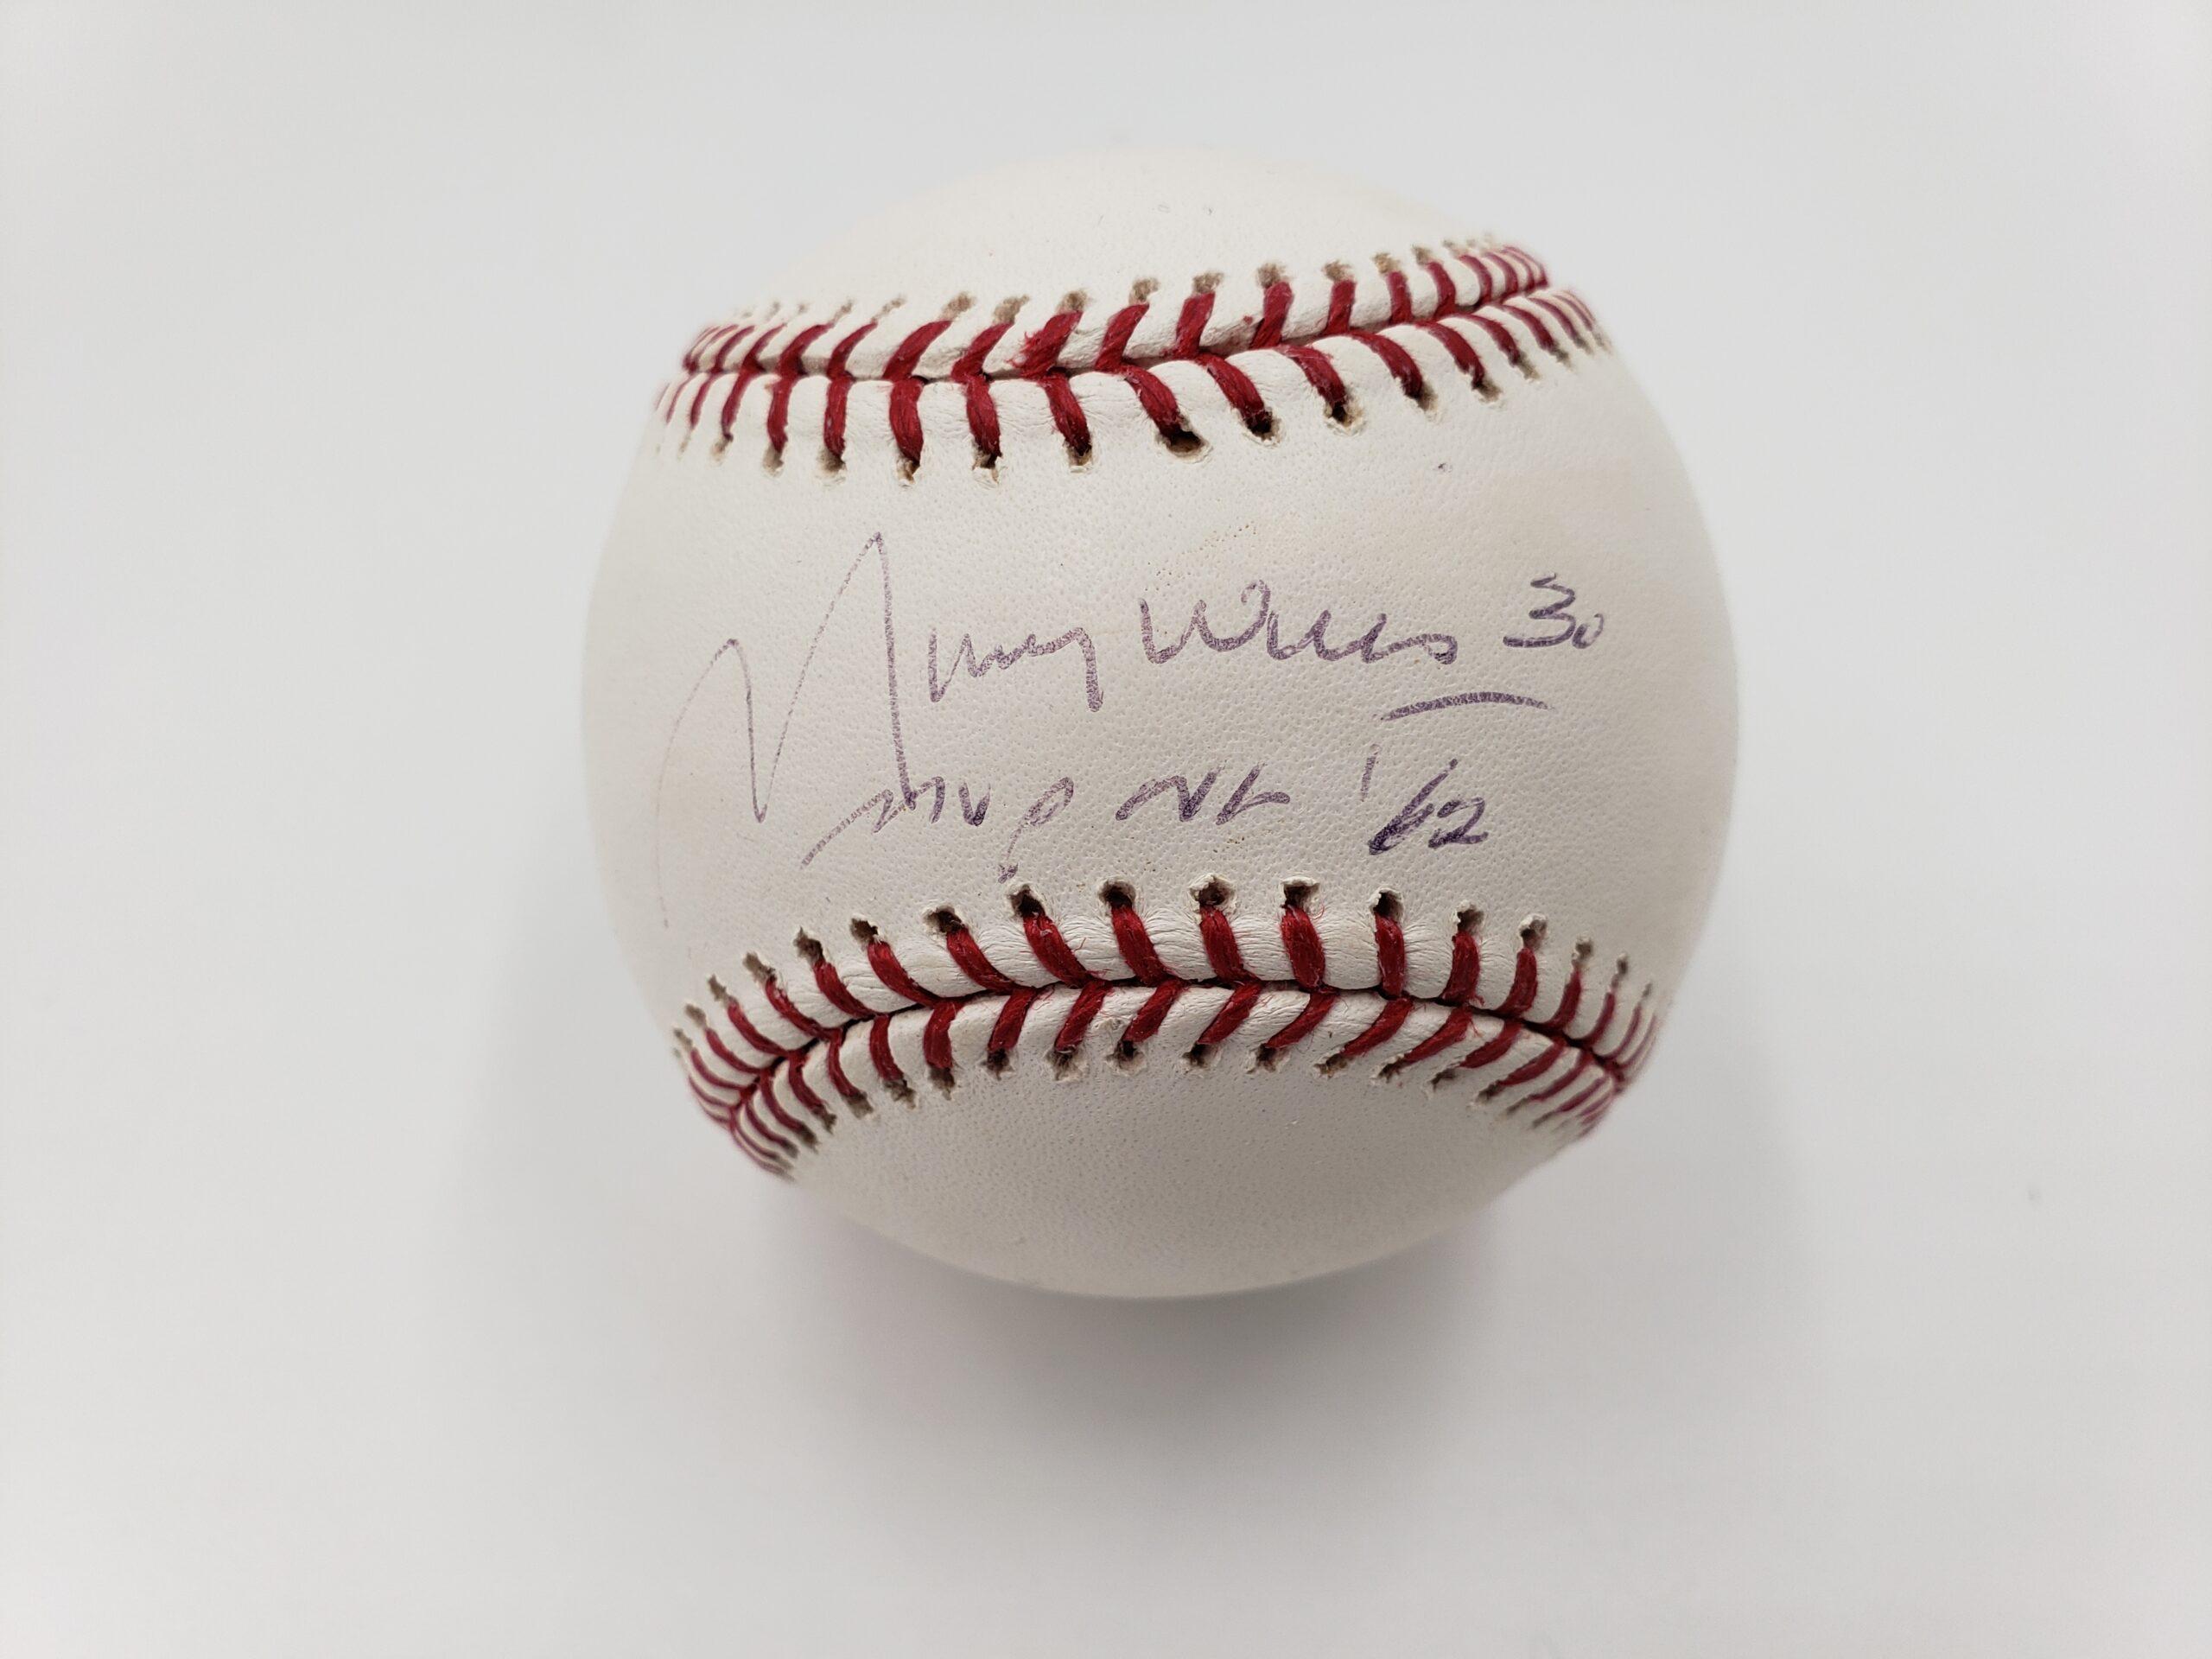 Maury Wills Autographed Baseball